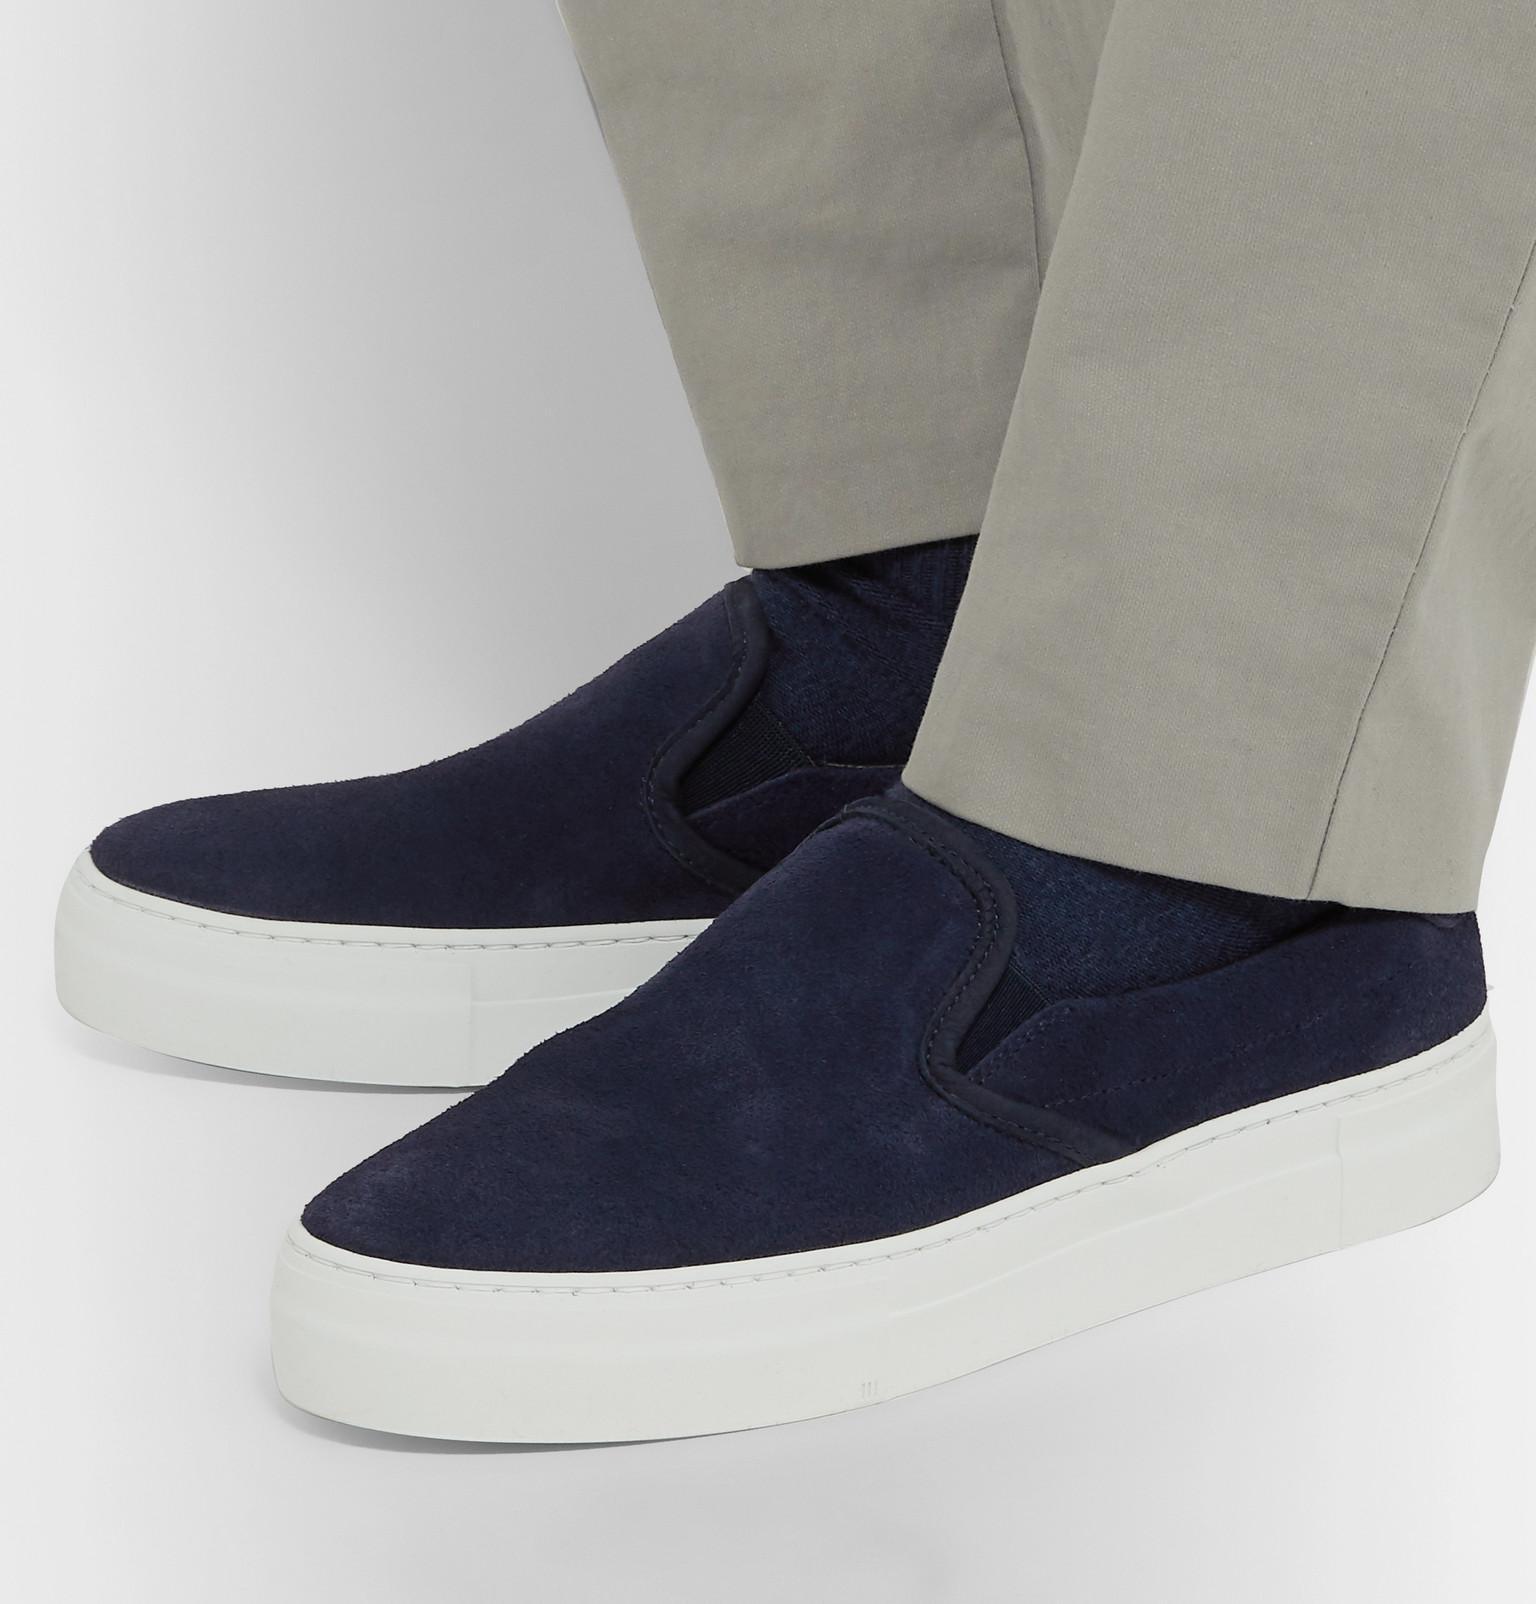 Diemme Leather Garda Slip On in Navy (Blue) for Men - Save 55%